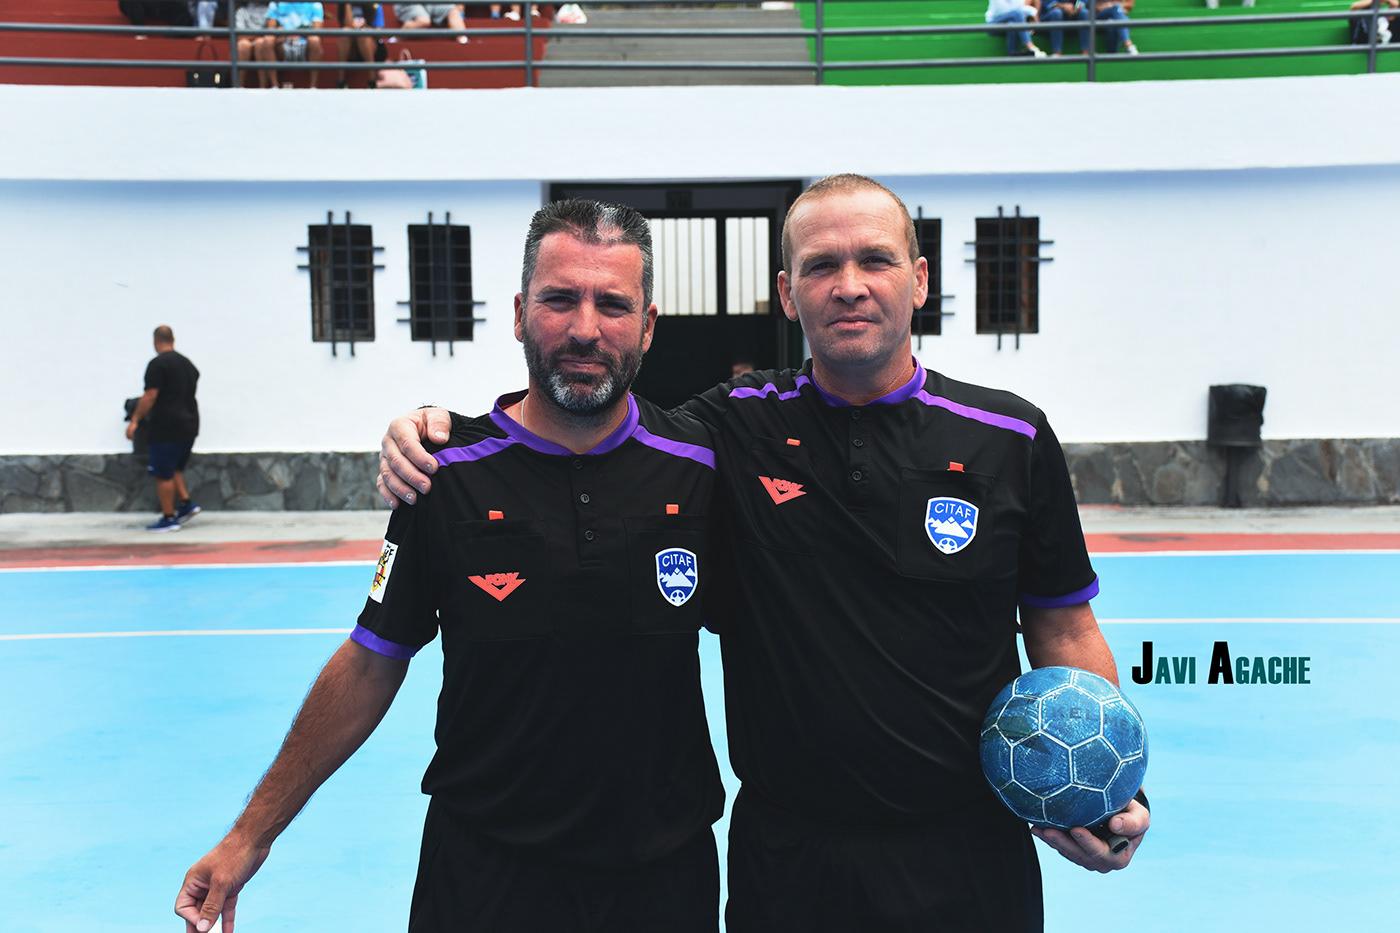 Futsal Hermigua Fútbol sala futsal Fútbol Sala Femenino Futsalfem La Gomera Hermigua fútbol femenino Futsal Femenino El Palmar